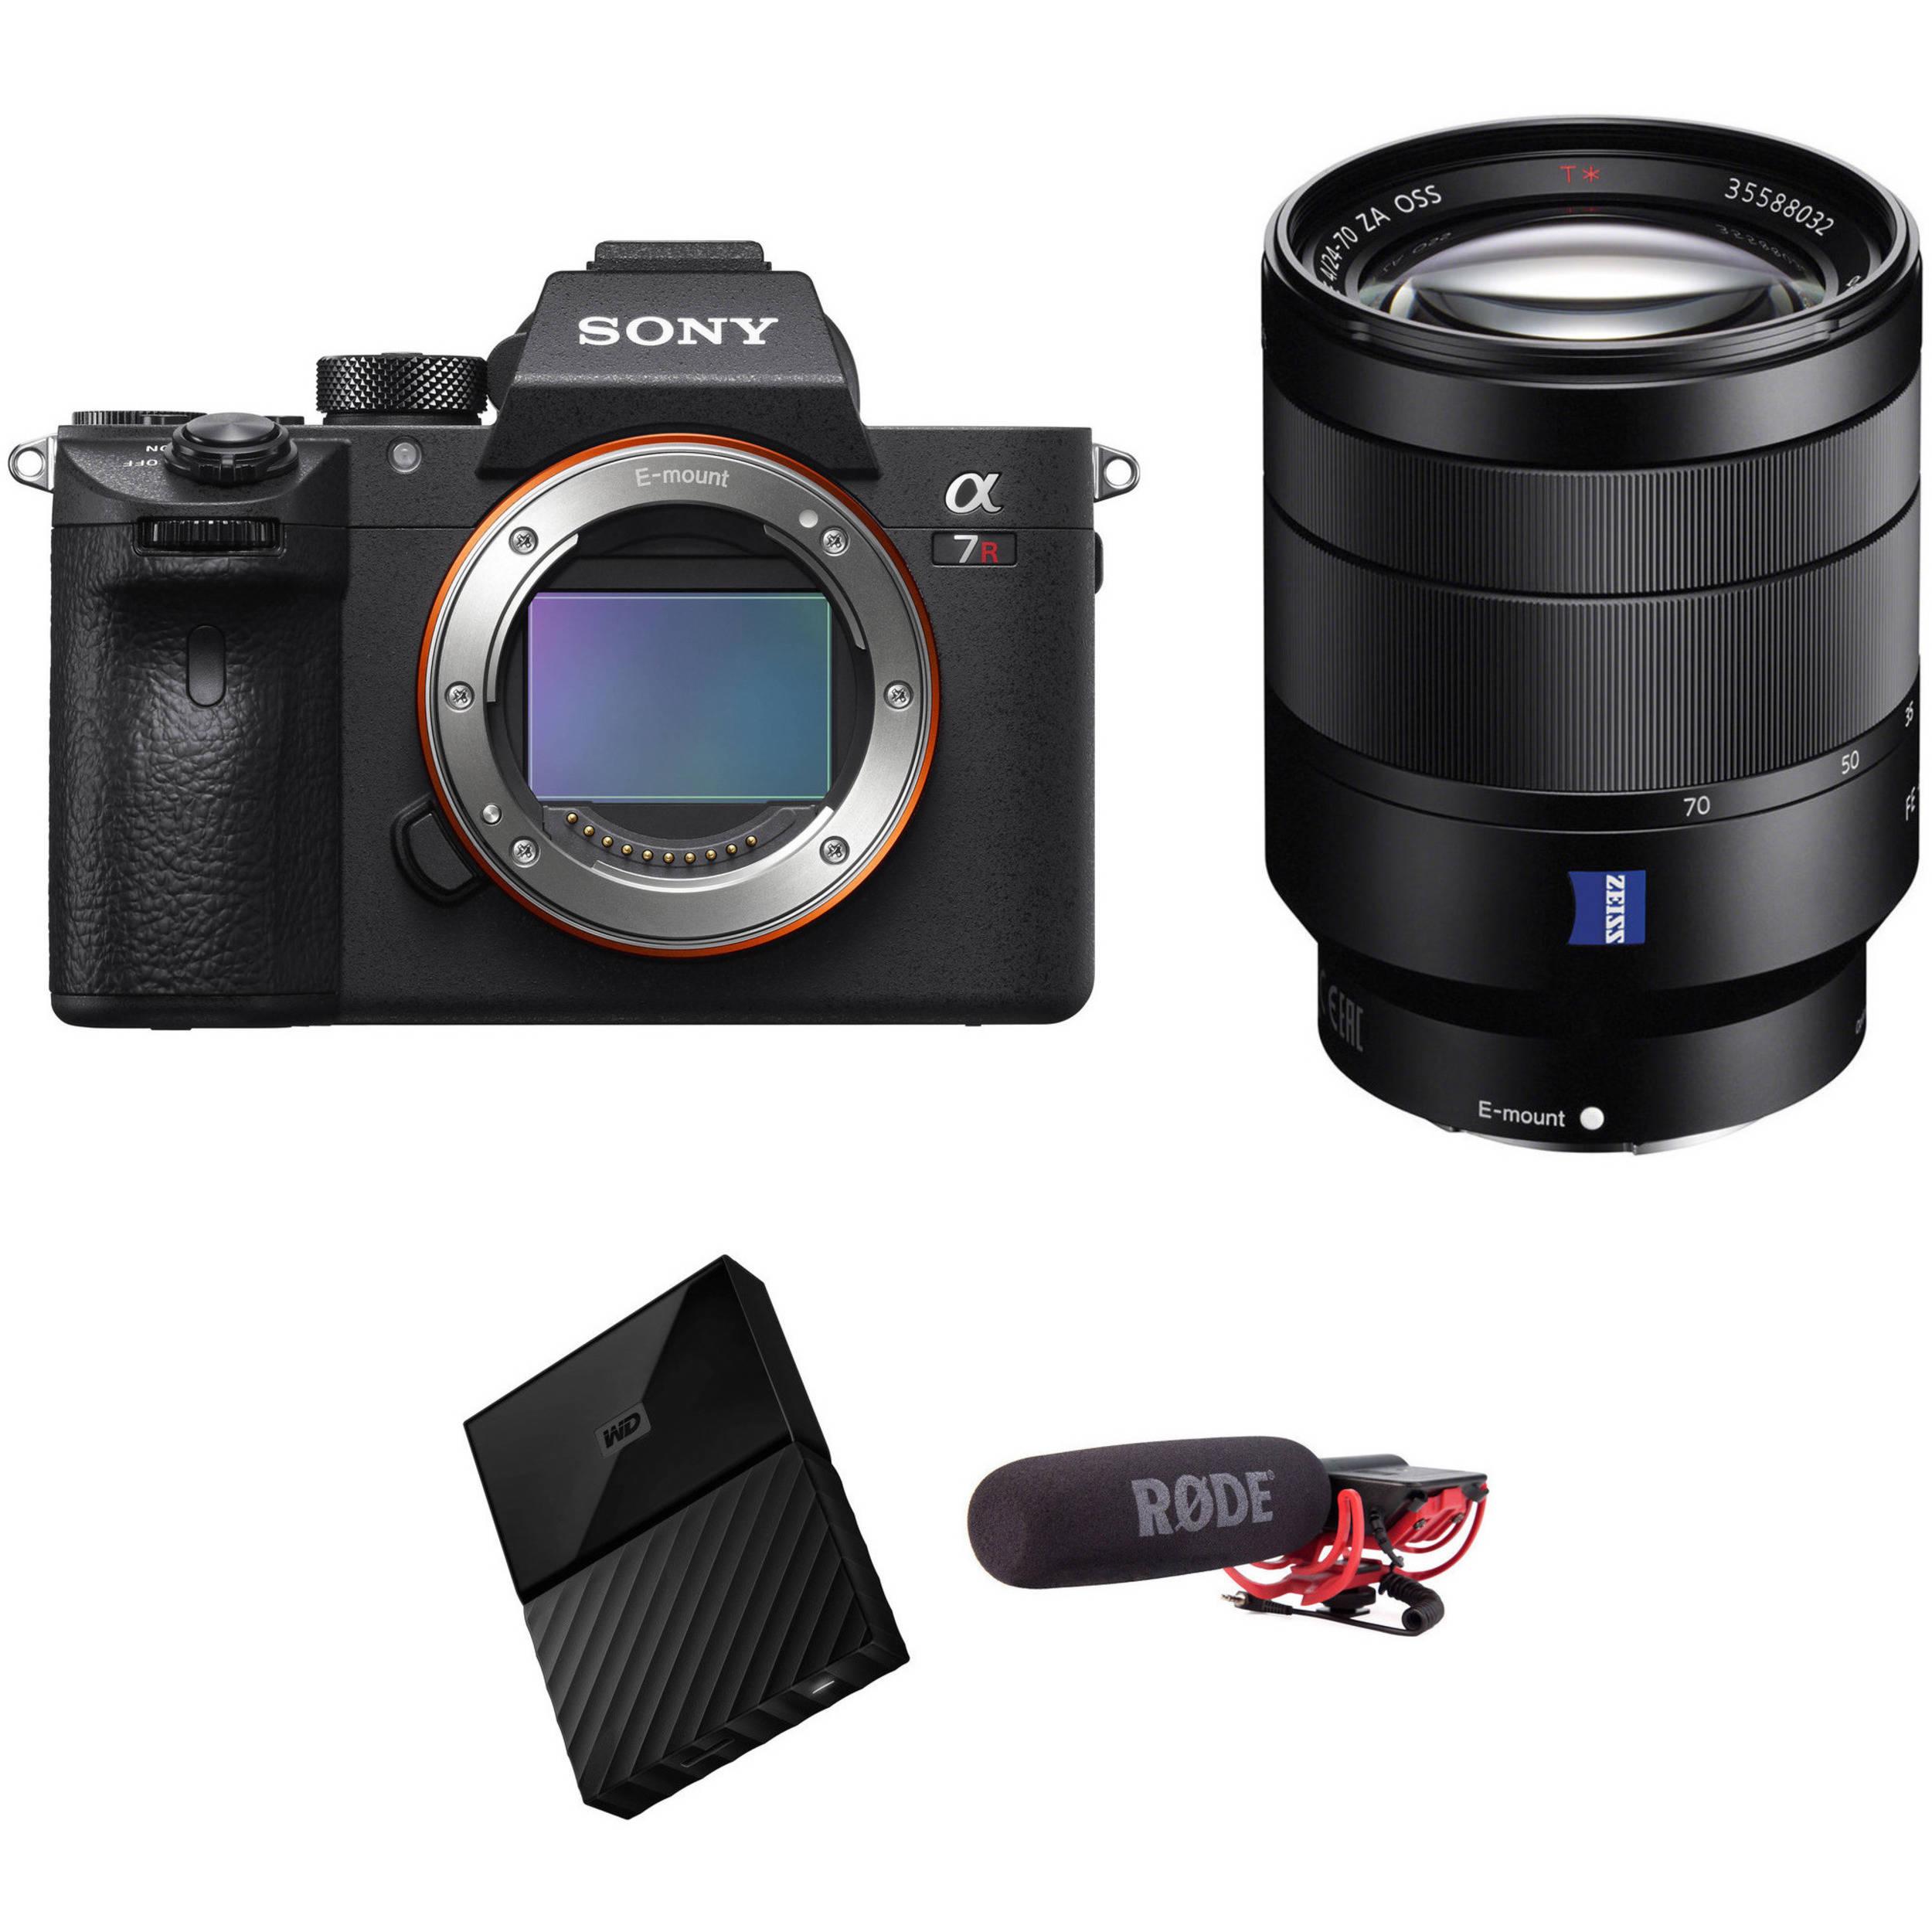 Digital camera storage options линия тренда